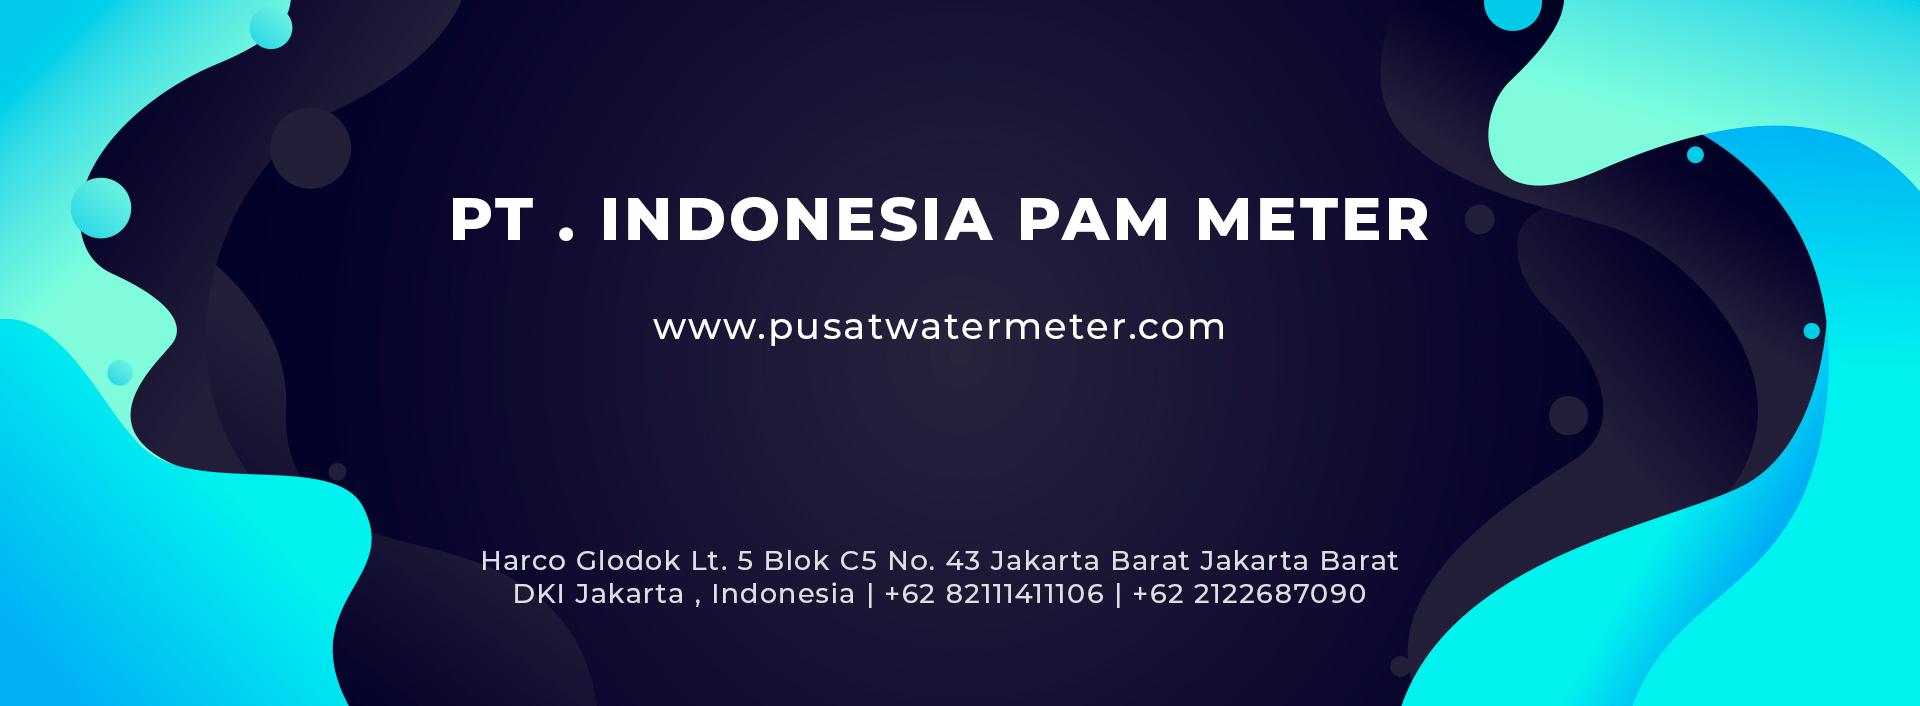 Toko Indonesia Pam Meter